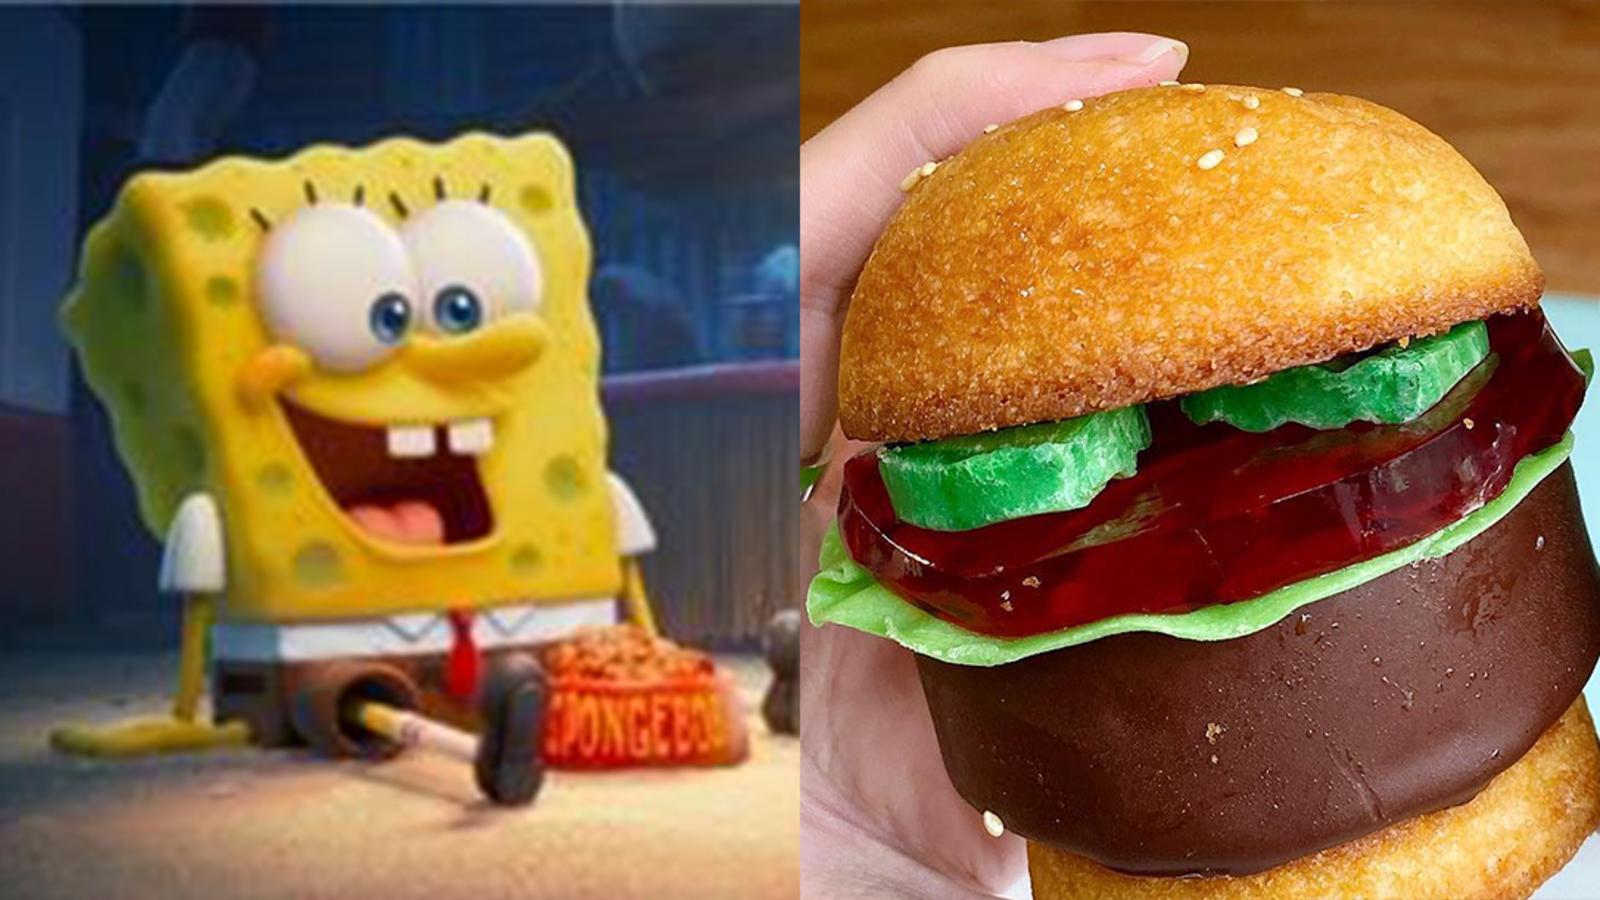 10394866_030721-ktrk-spongebob-burger-img.jpg